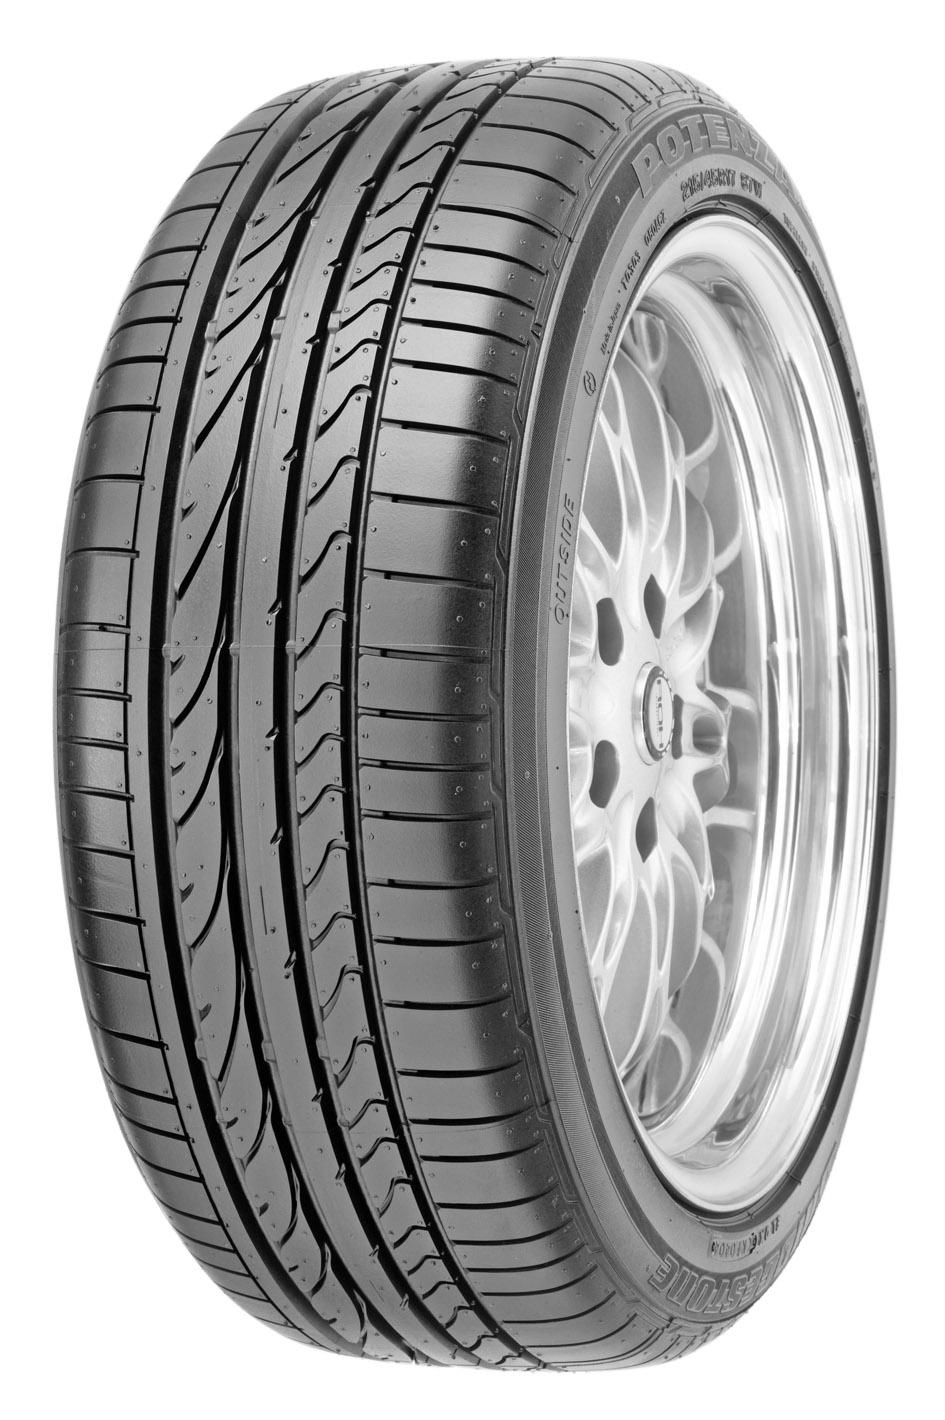 Bridgestone Potenza RE050A 245/40 R19 98W FR XL